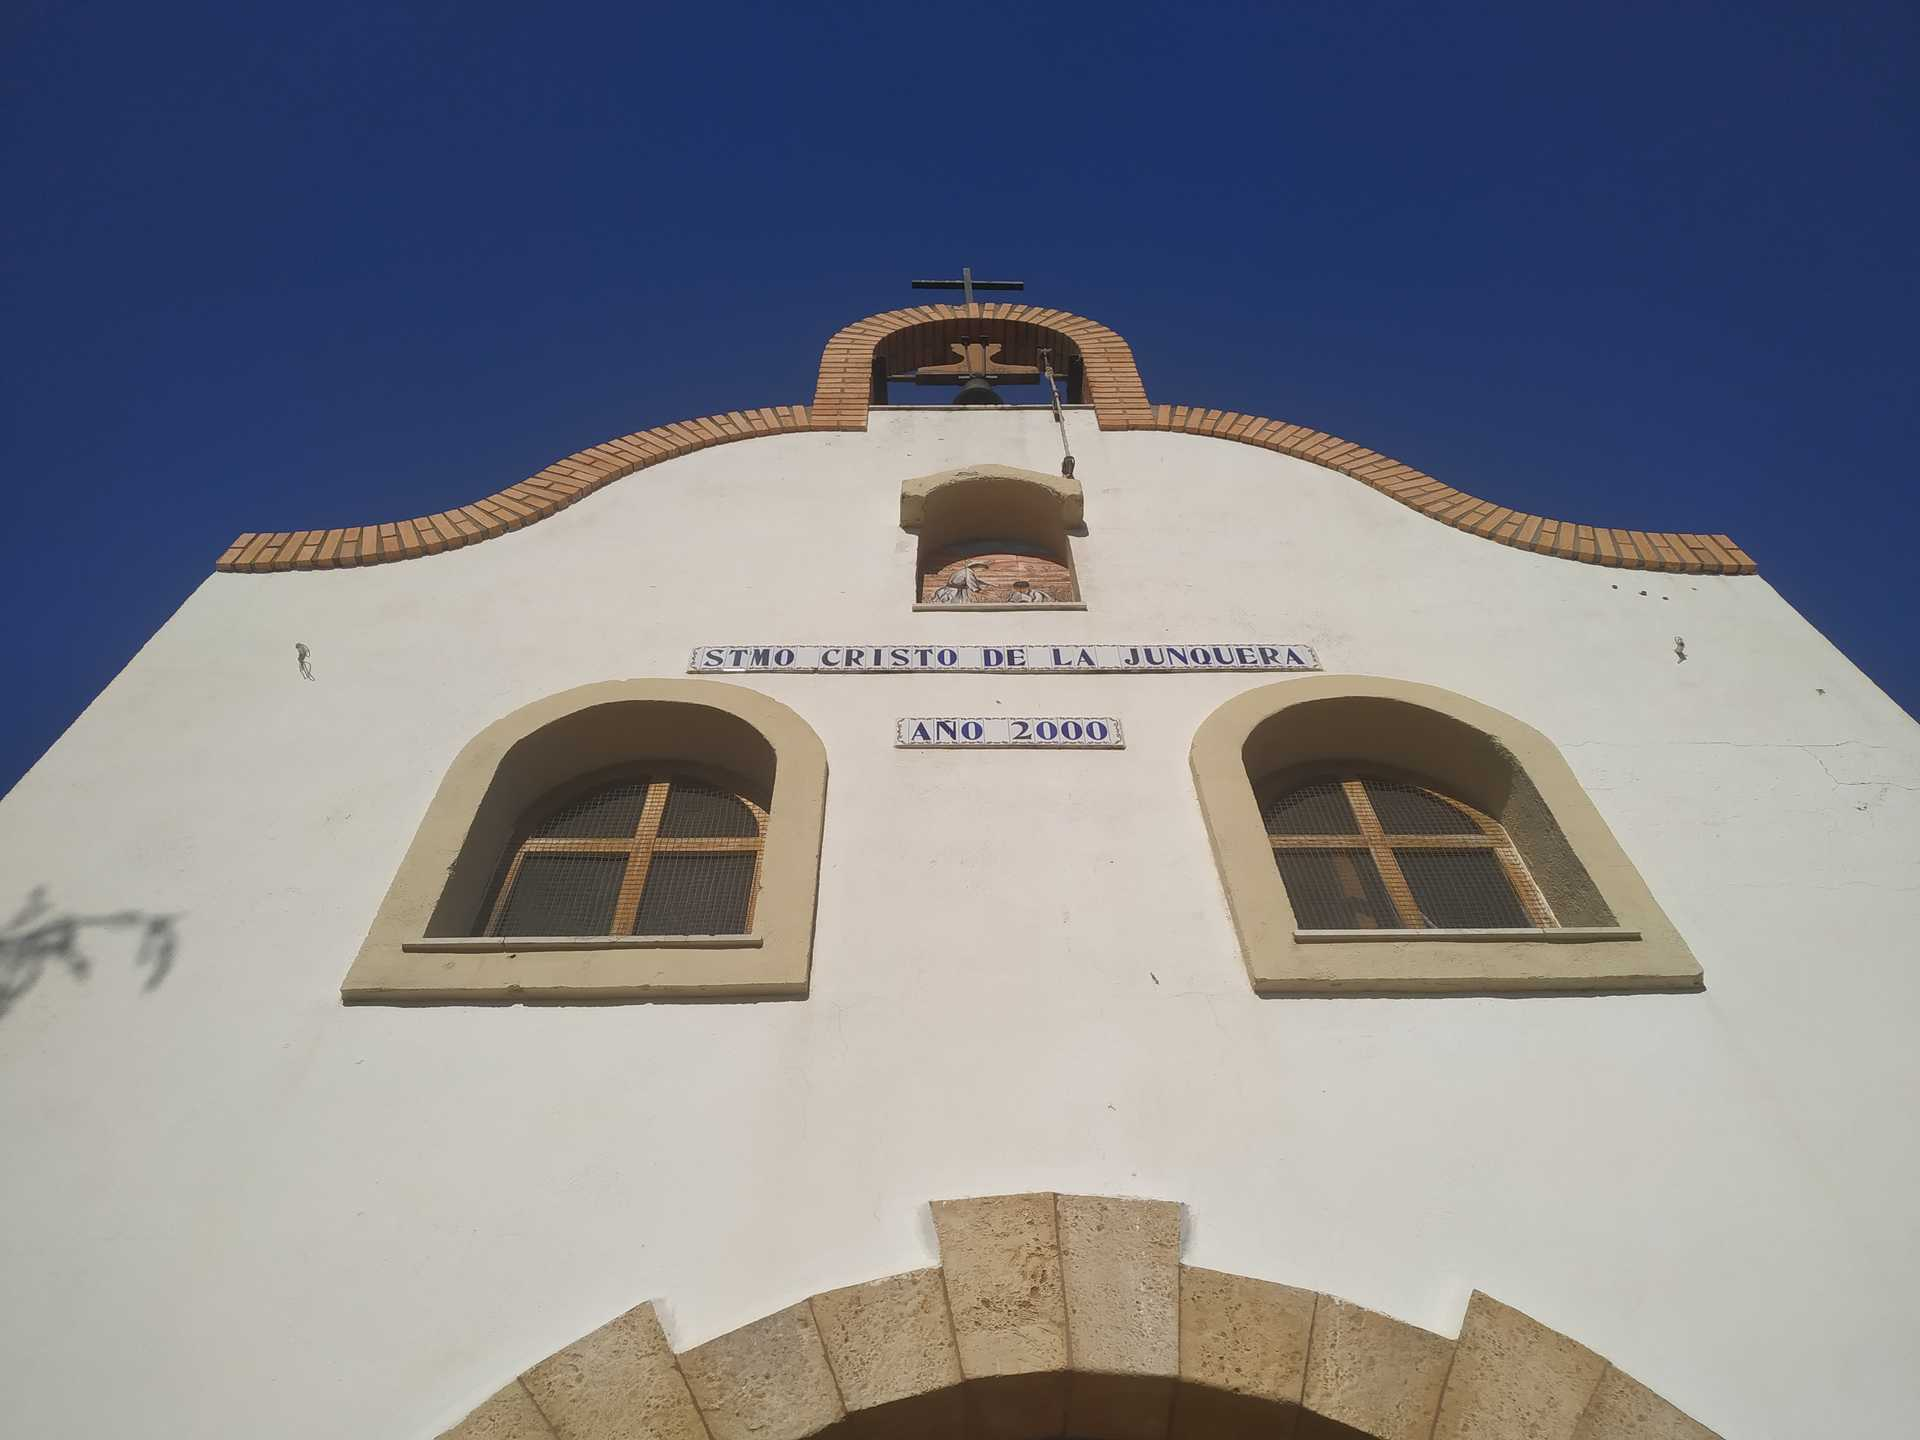 THE SANTO CRISTO DE LA JUNQUERA HERMITAGE